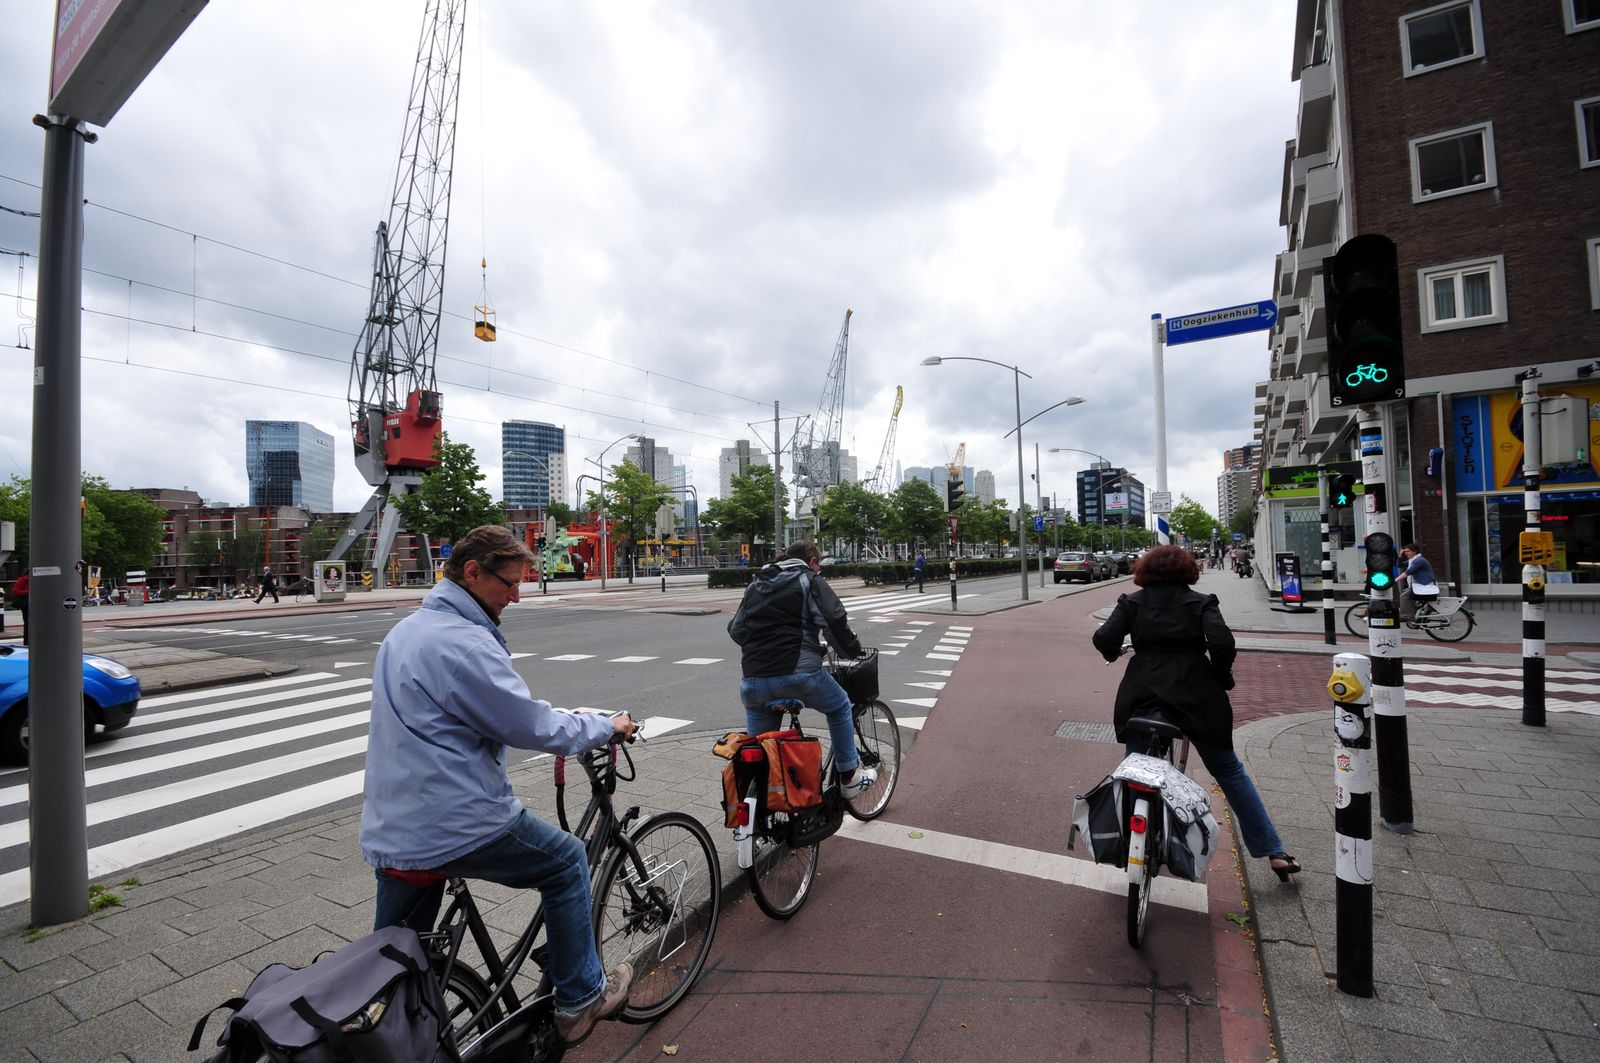 Geschützte Kreuzung für Fahrradfahrer